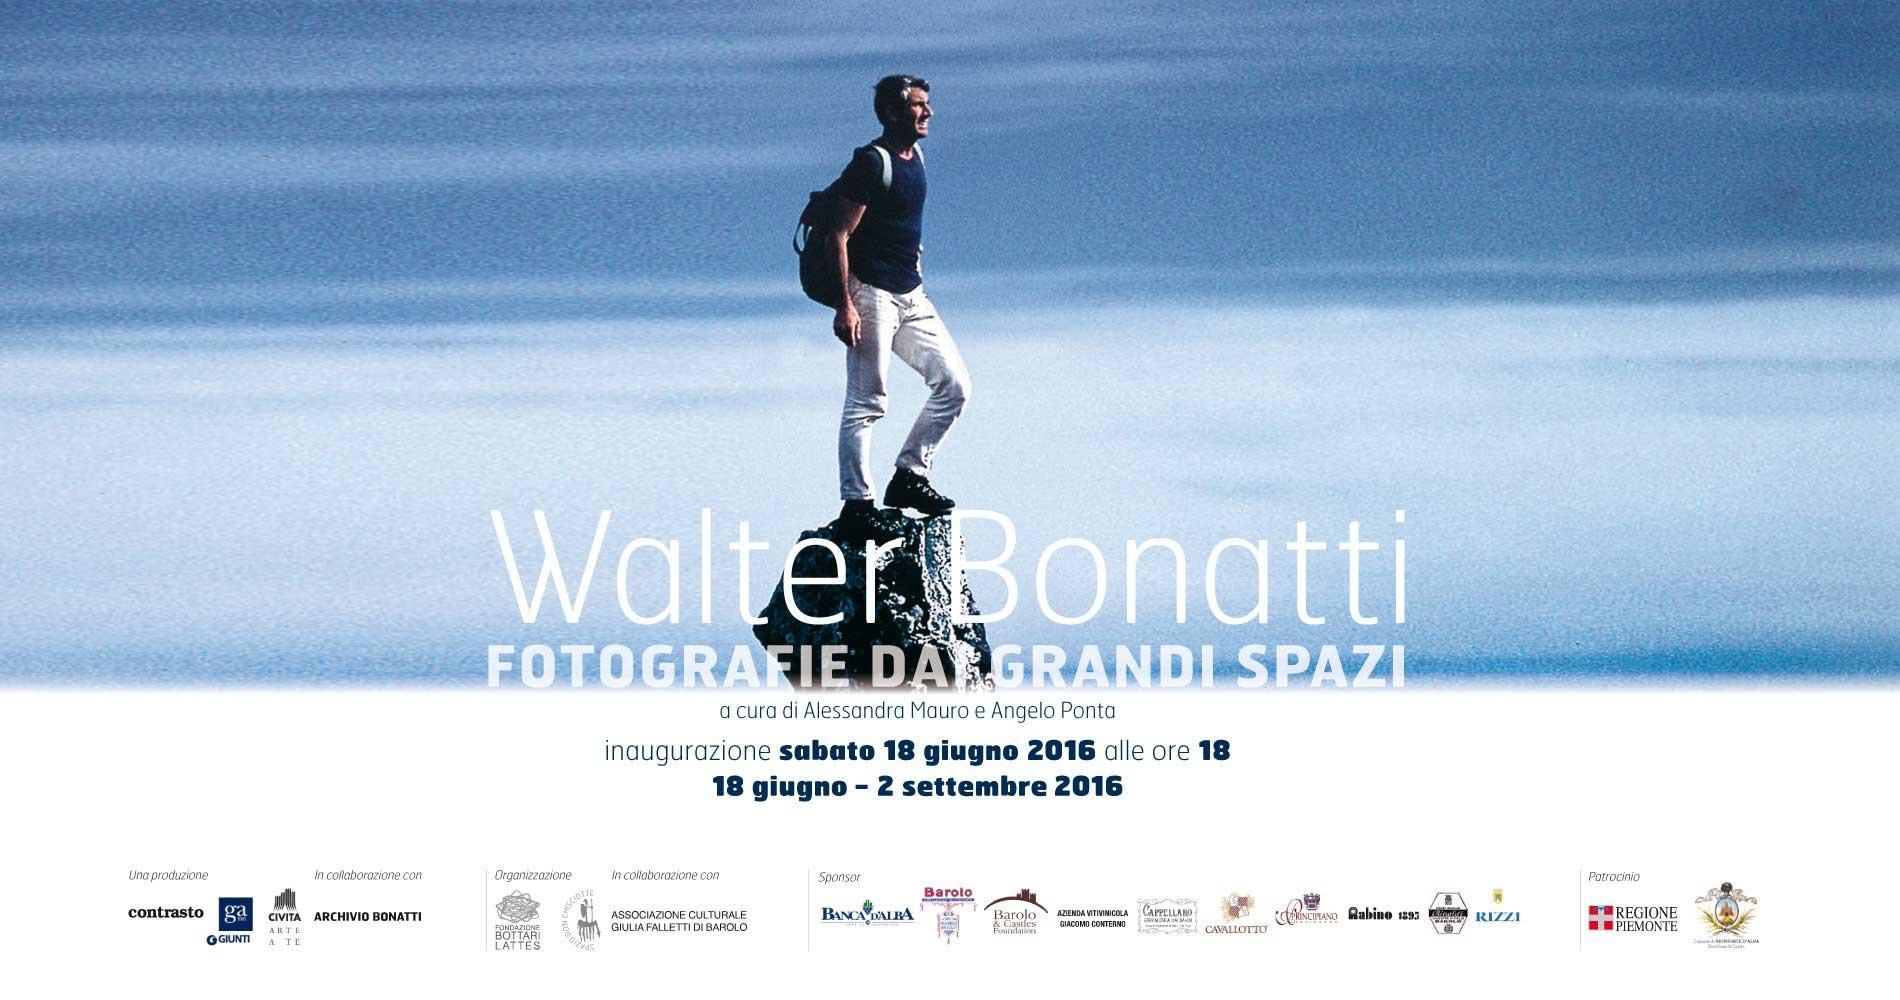 Walter Bonatti, fotografie da grandi spazi